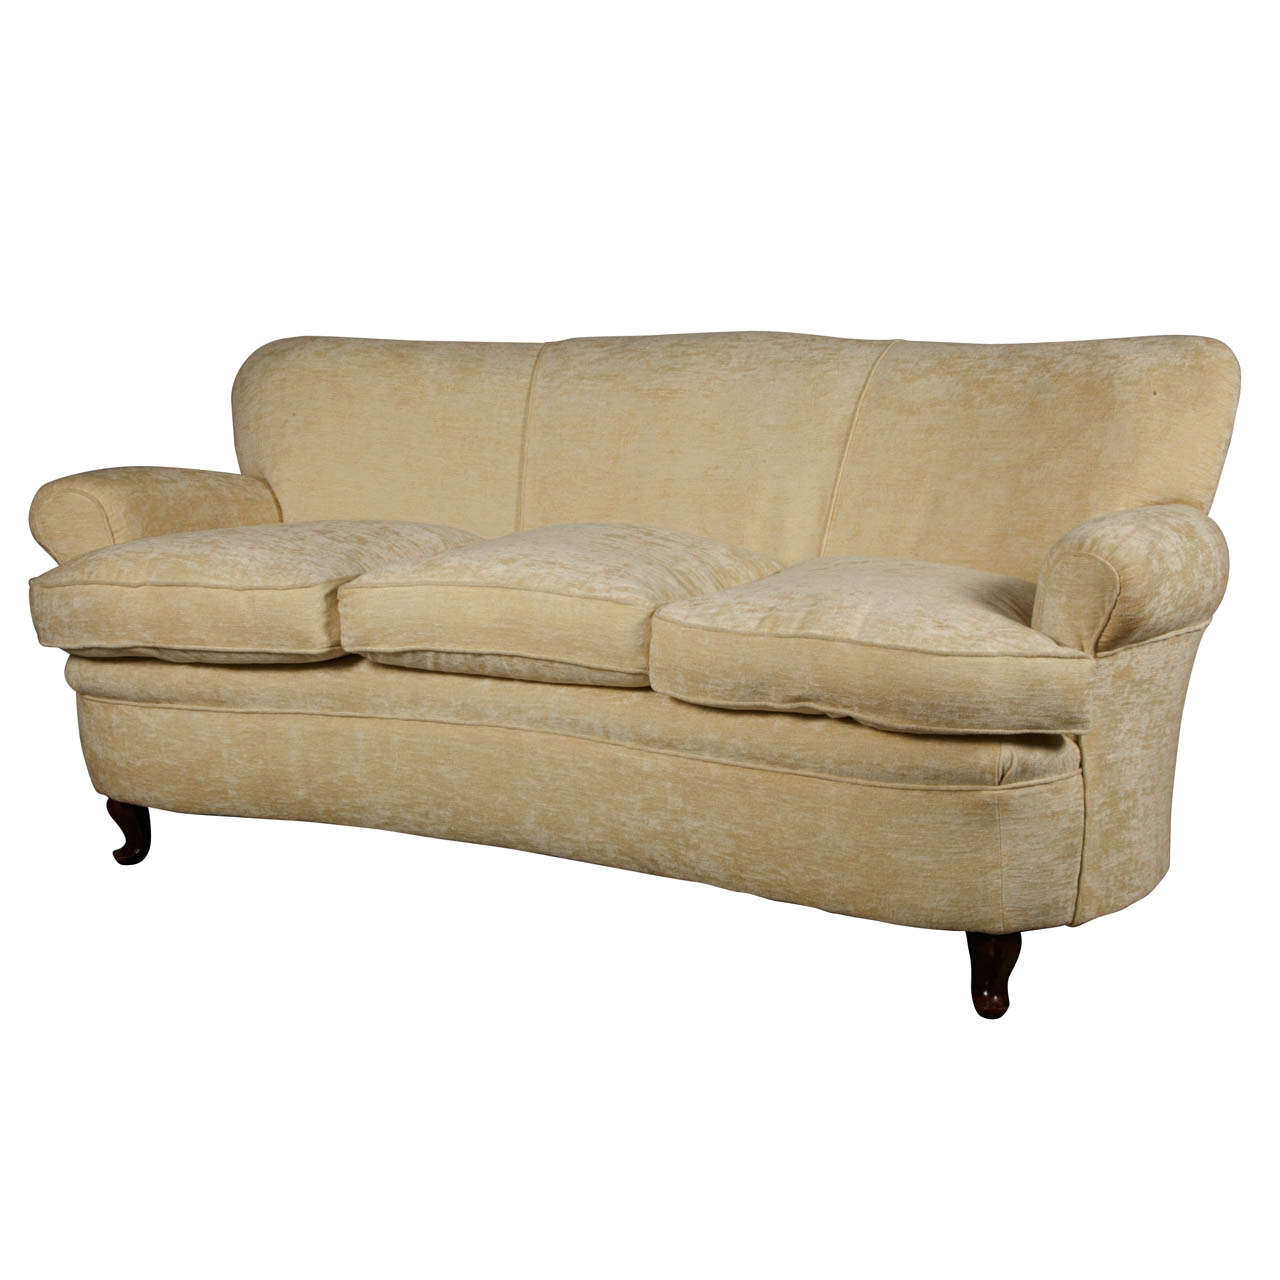 1950s italian curved sofa settee at 1stdibs